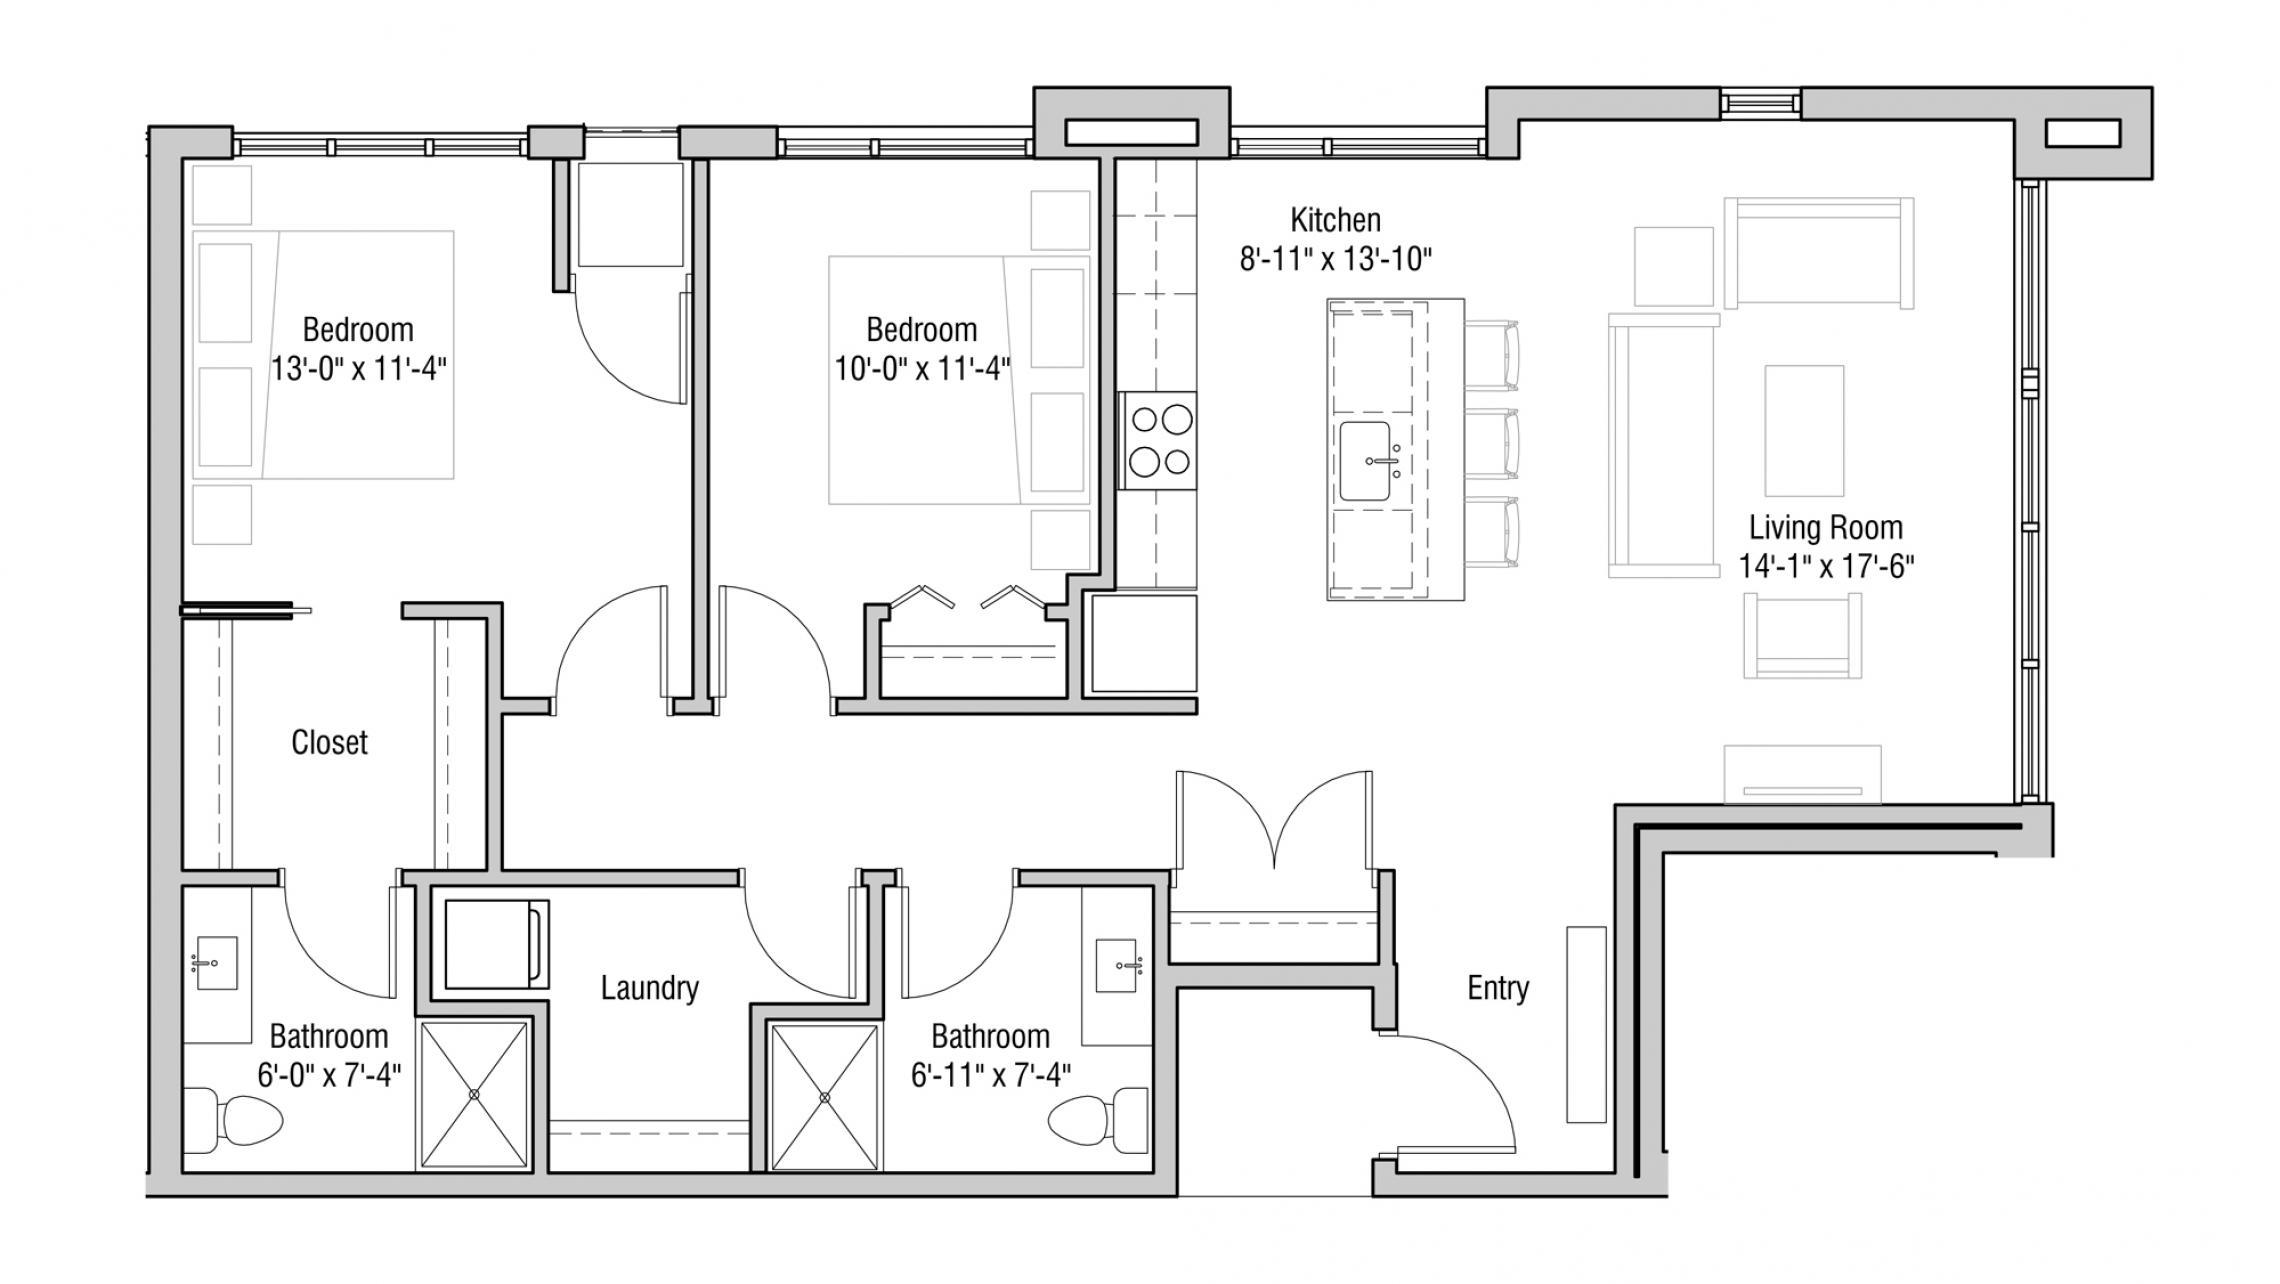 ULI Quarter Row 315 - Two Bedroom, Two Bathroom